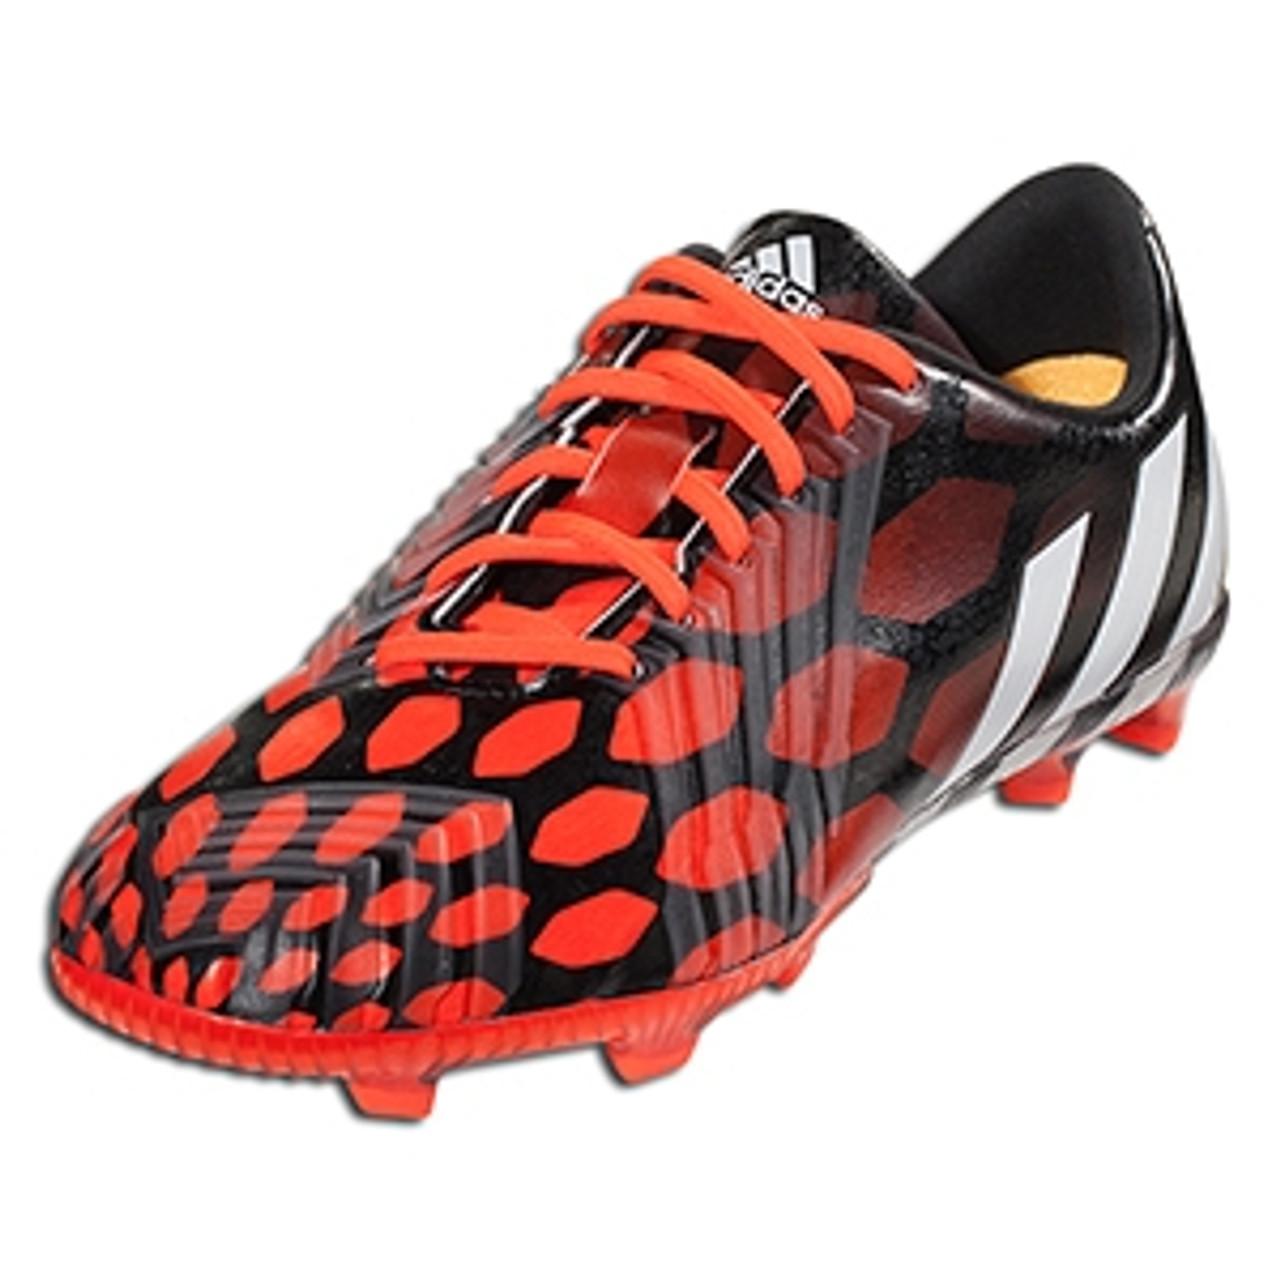 6d8992539ef1 adidas JR Predator Instinct FG - Black Solar Red SD (21517) - ohp soccer